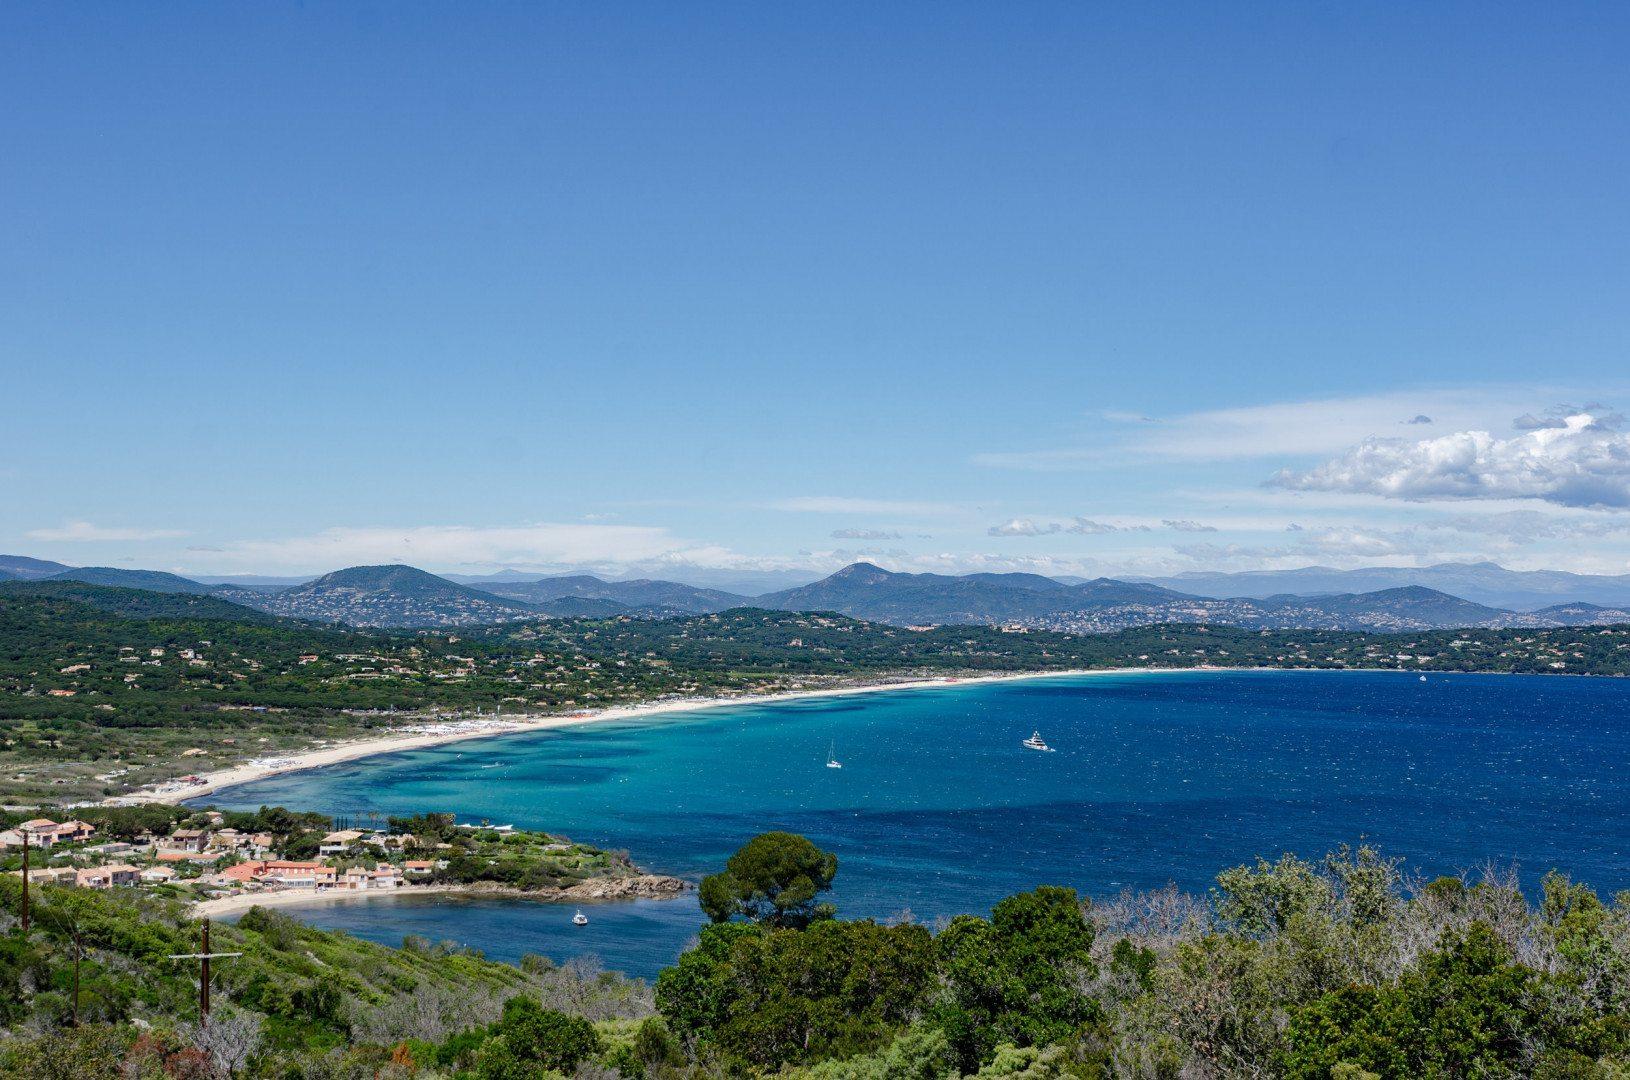 pampelonne-beach-saint-tropez